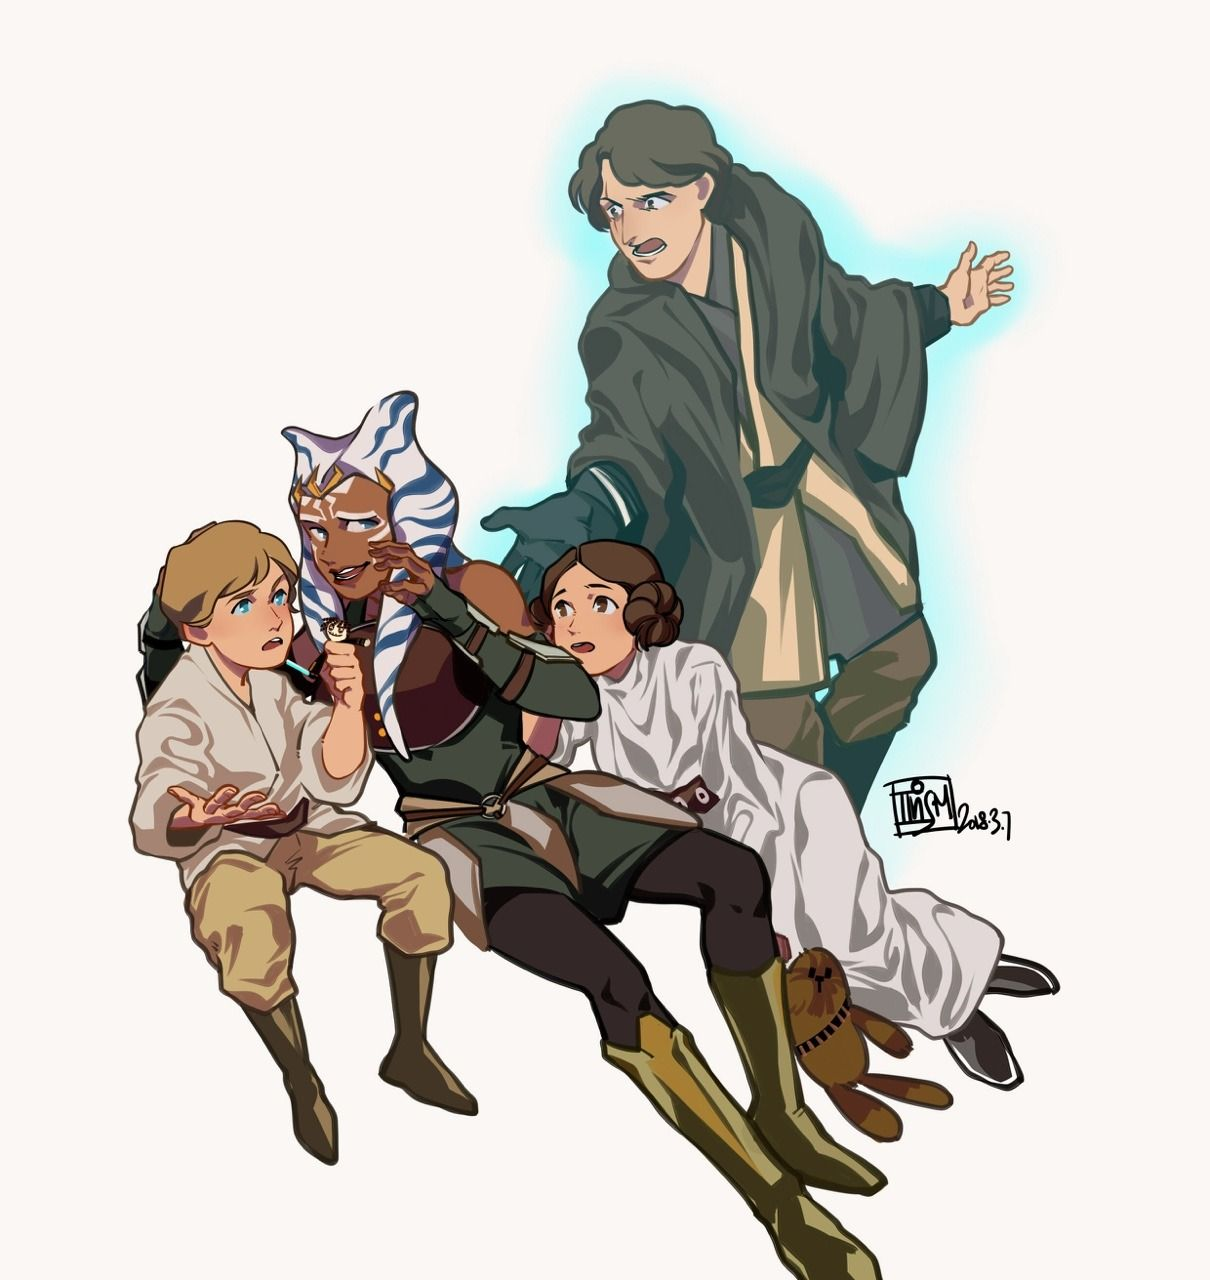 Give Me Clones Star Wars Comics Star Wars Humor Star Wars Art